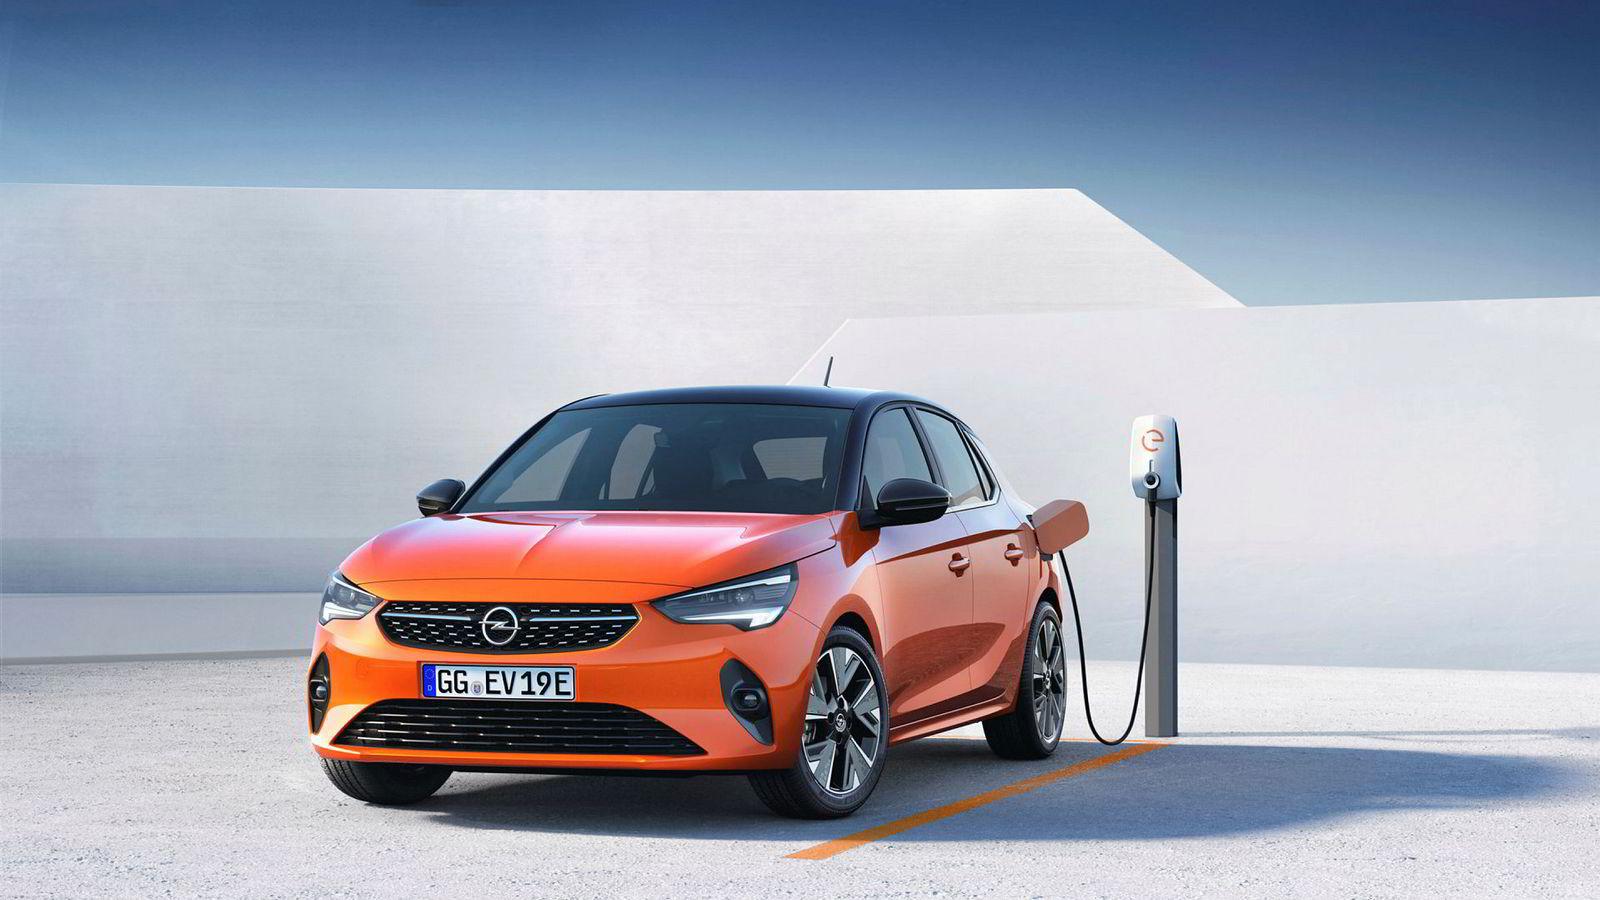 Opel Corsa kommer som elbil med 33 mils rekkevidde.